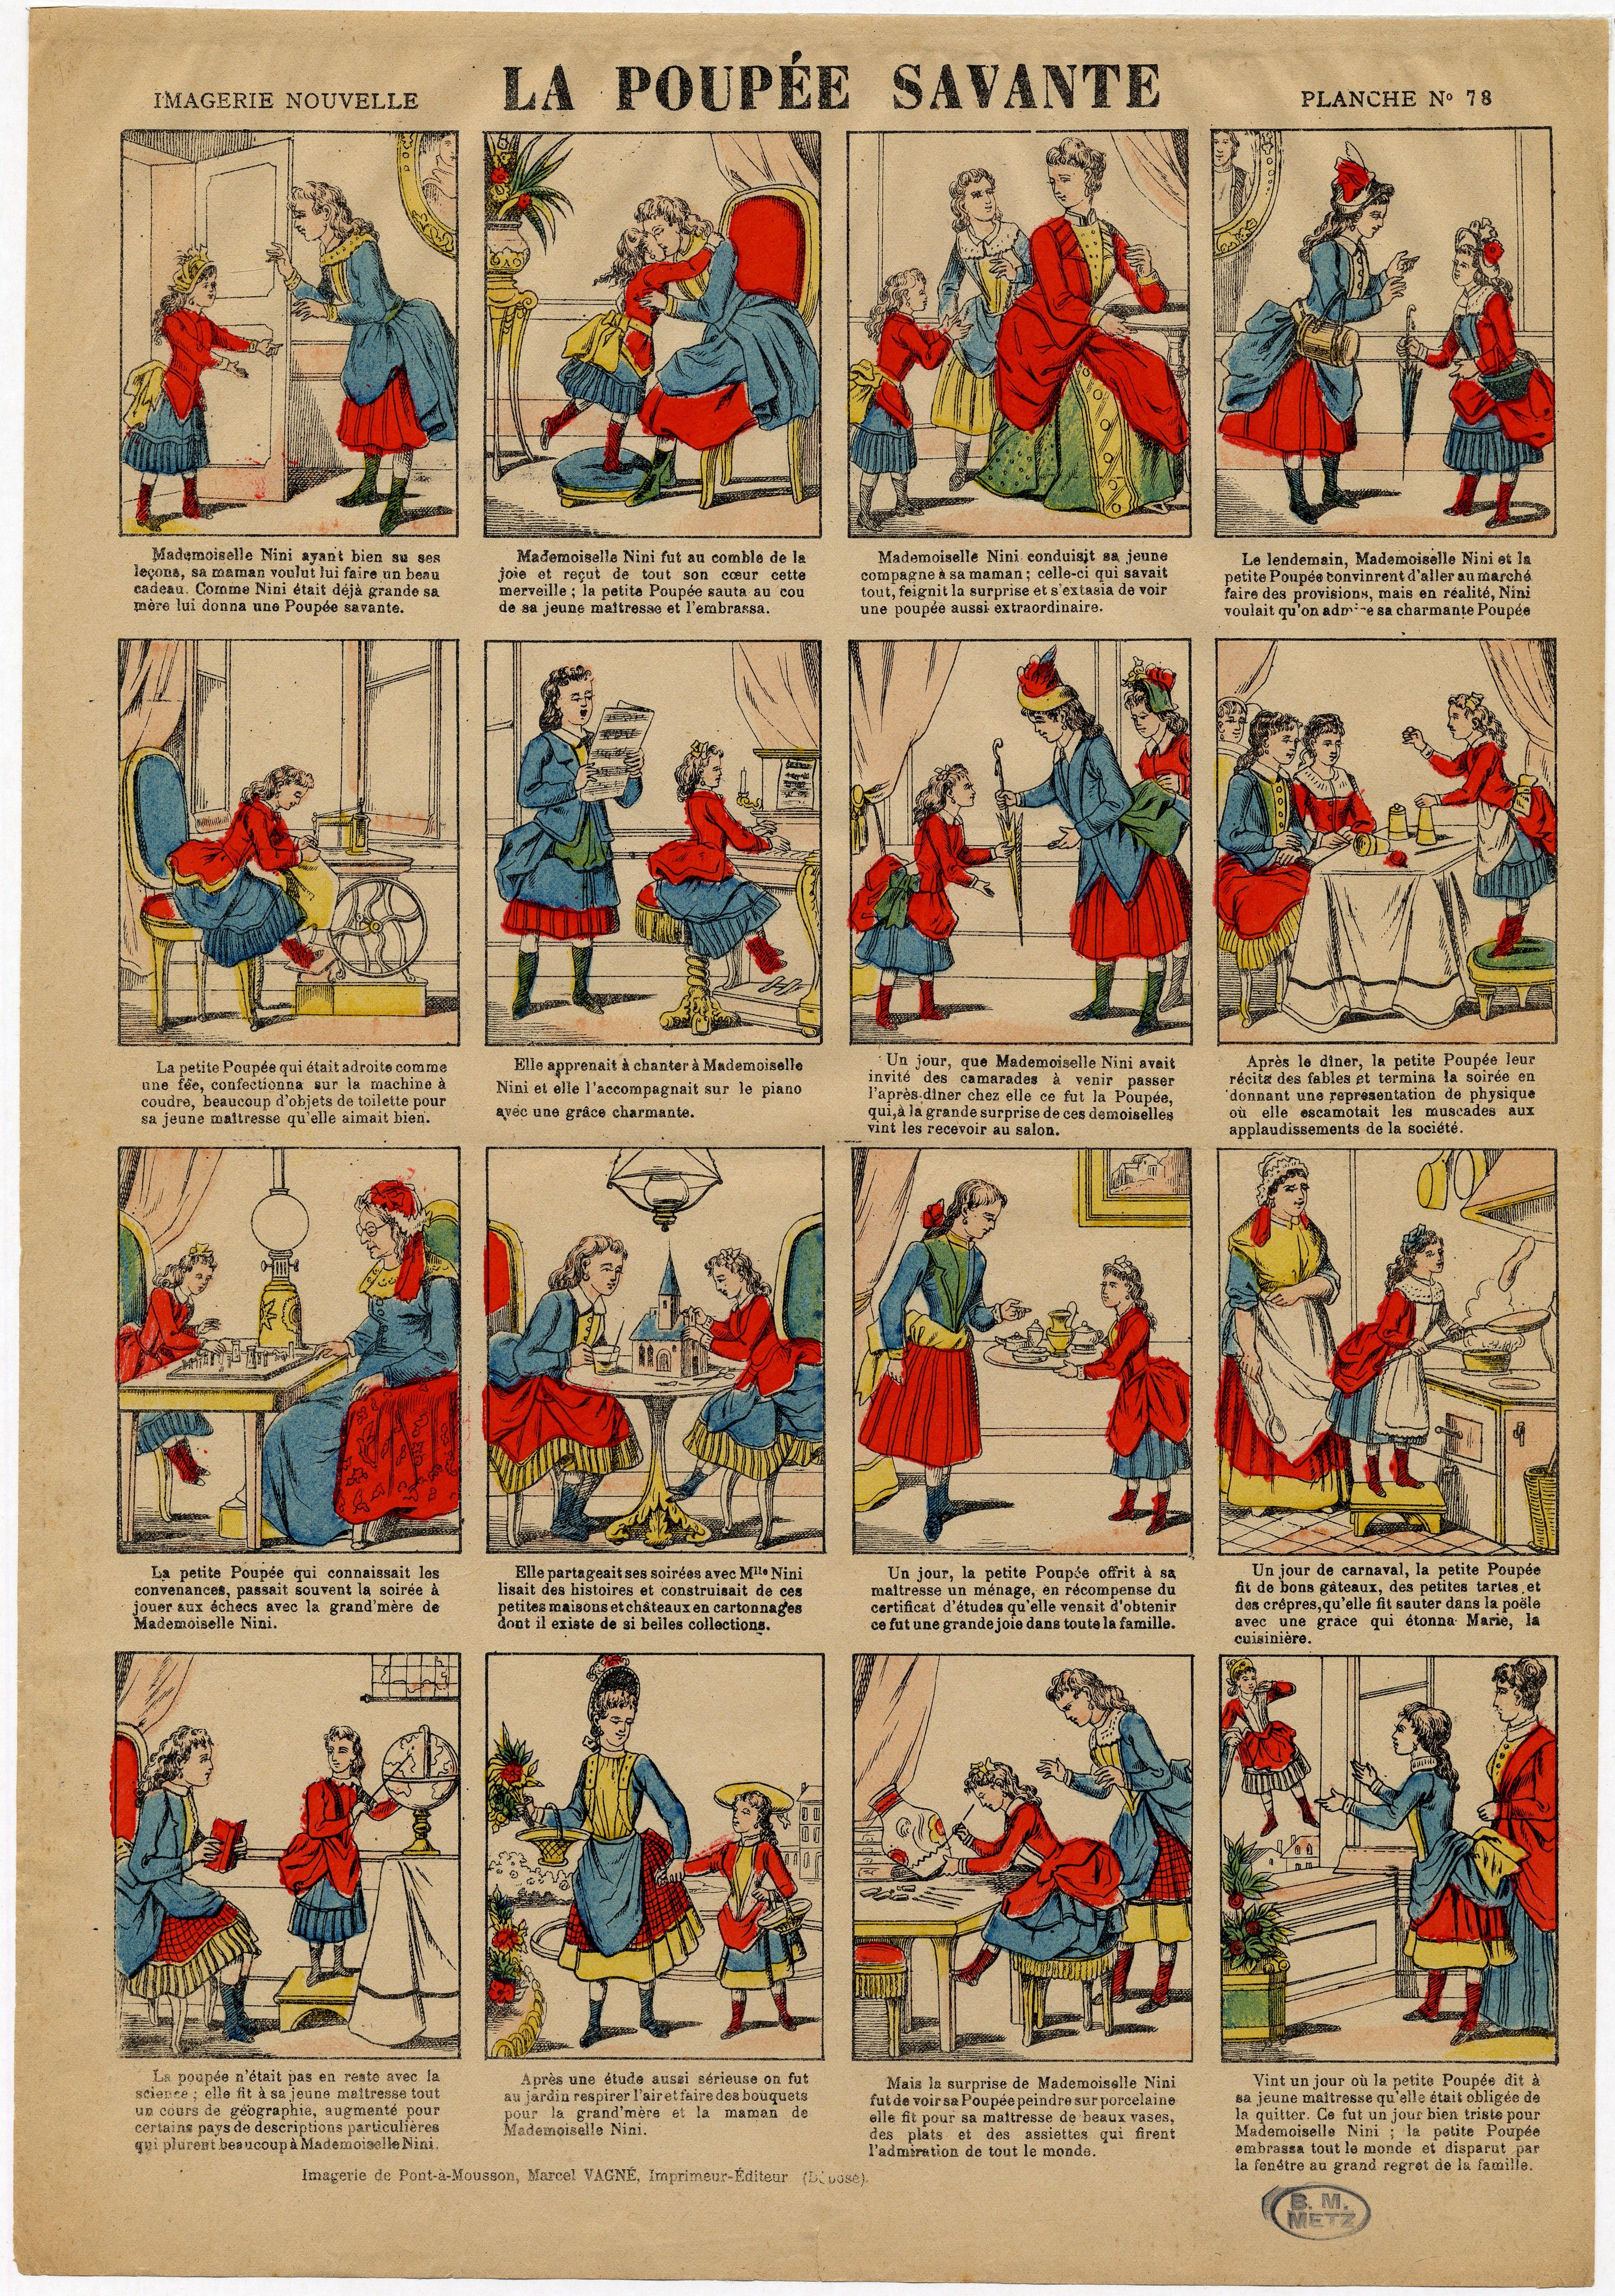 Contenu du La poupée savante